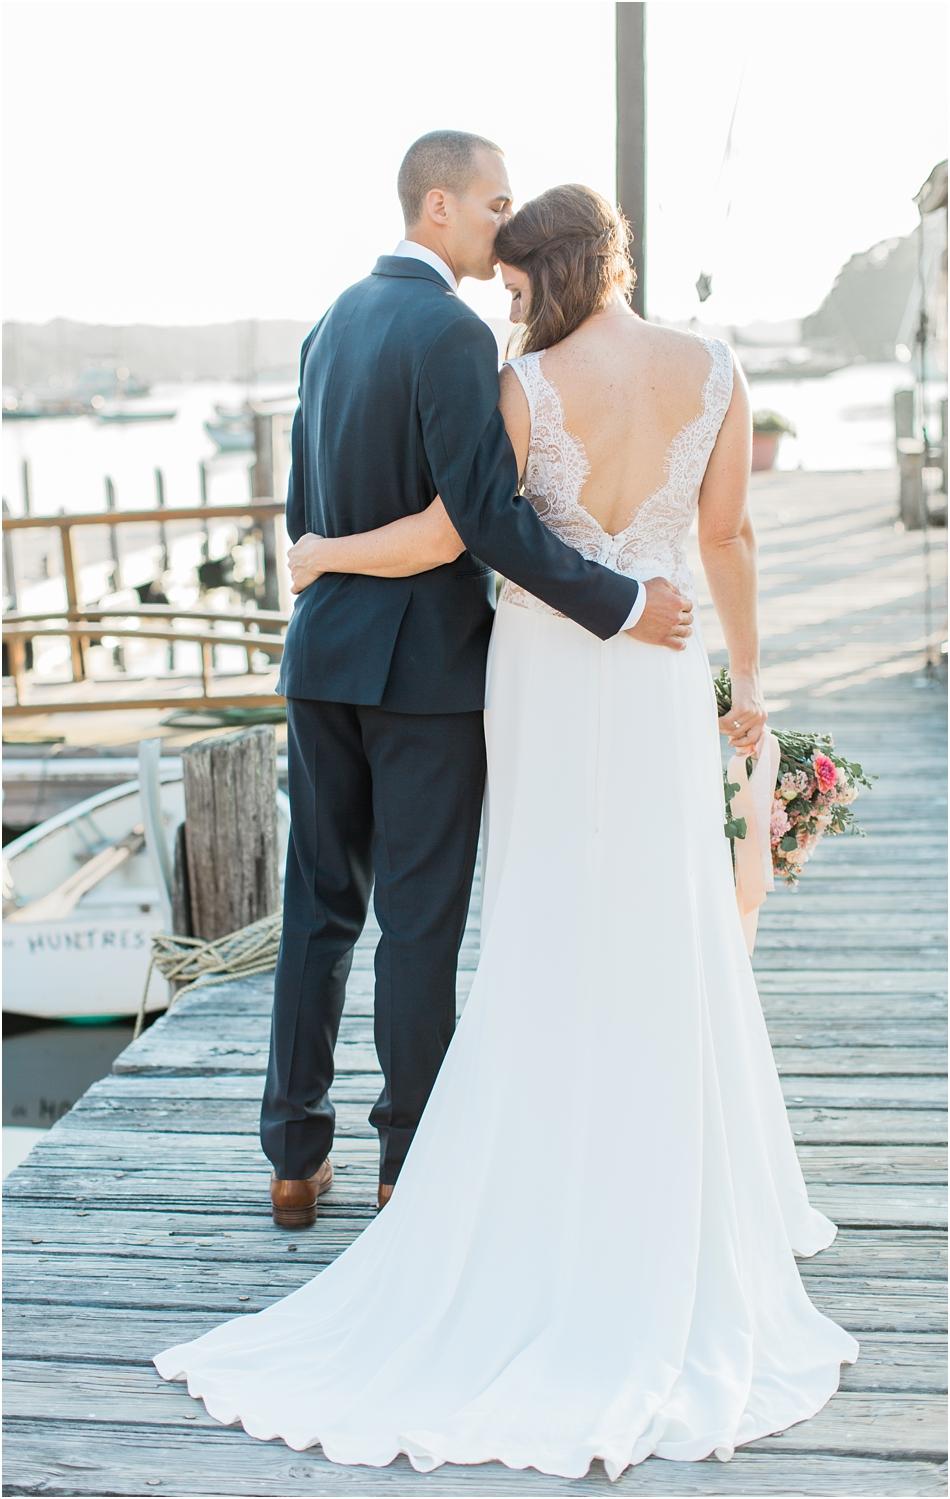 quissett_harbor_house_tented_caity_joe_cape_cod_boston_new_england_wedding_photographer_Meredith_Jane_Photography_photo_2534.jpg